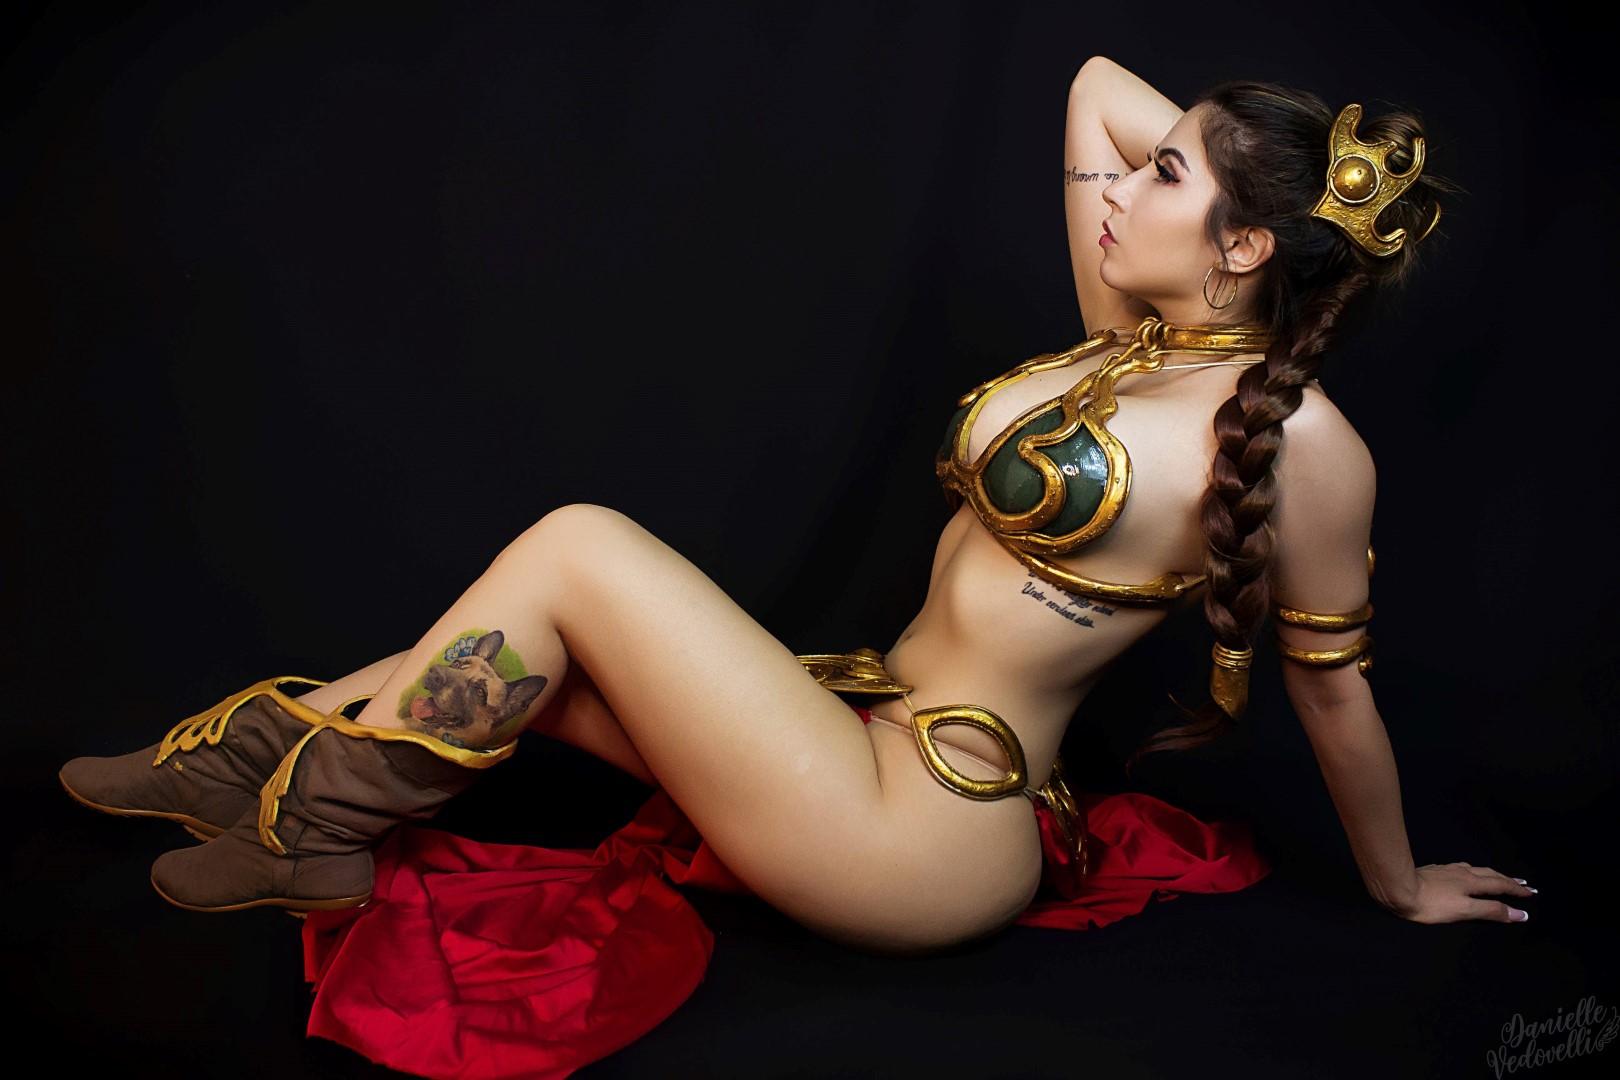 Charissa thompson topless